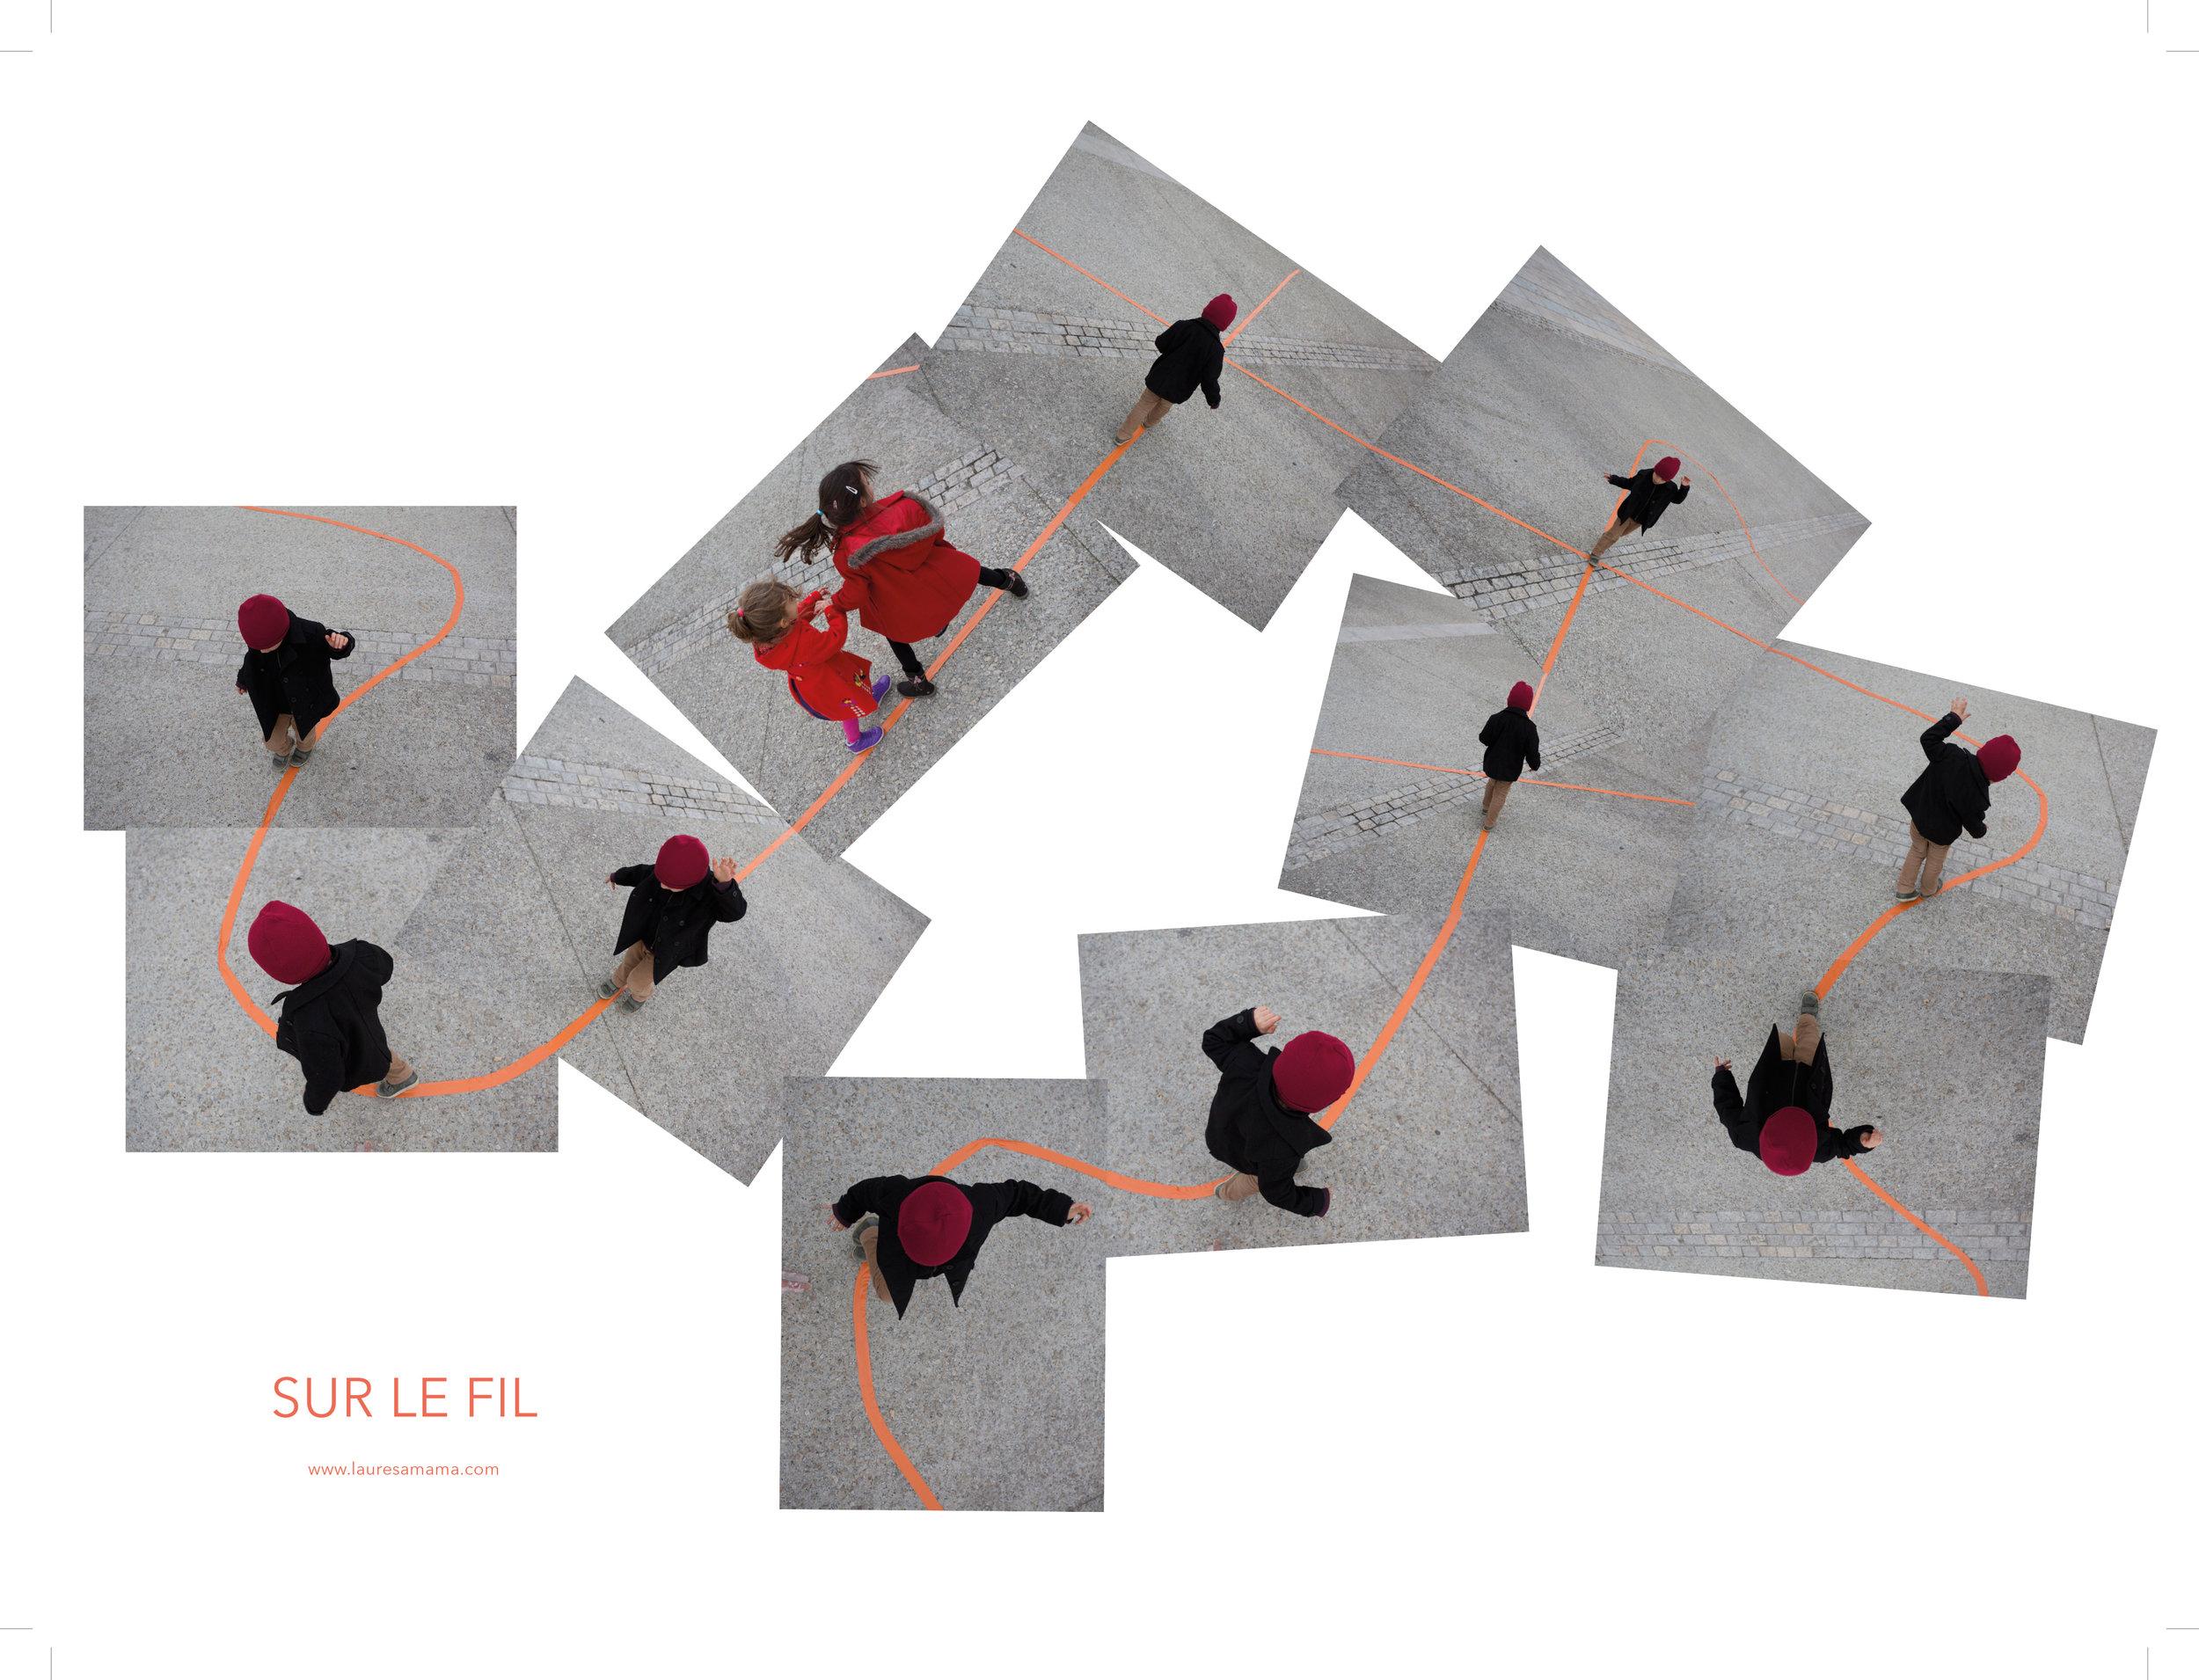 Surlefil-plan-1.jpg